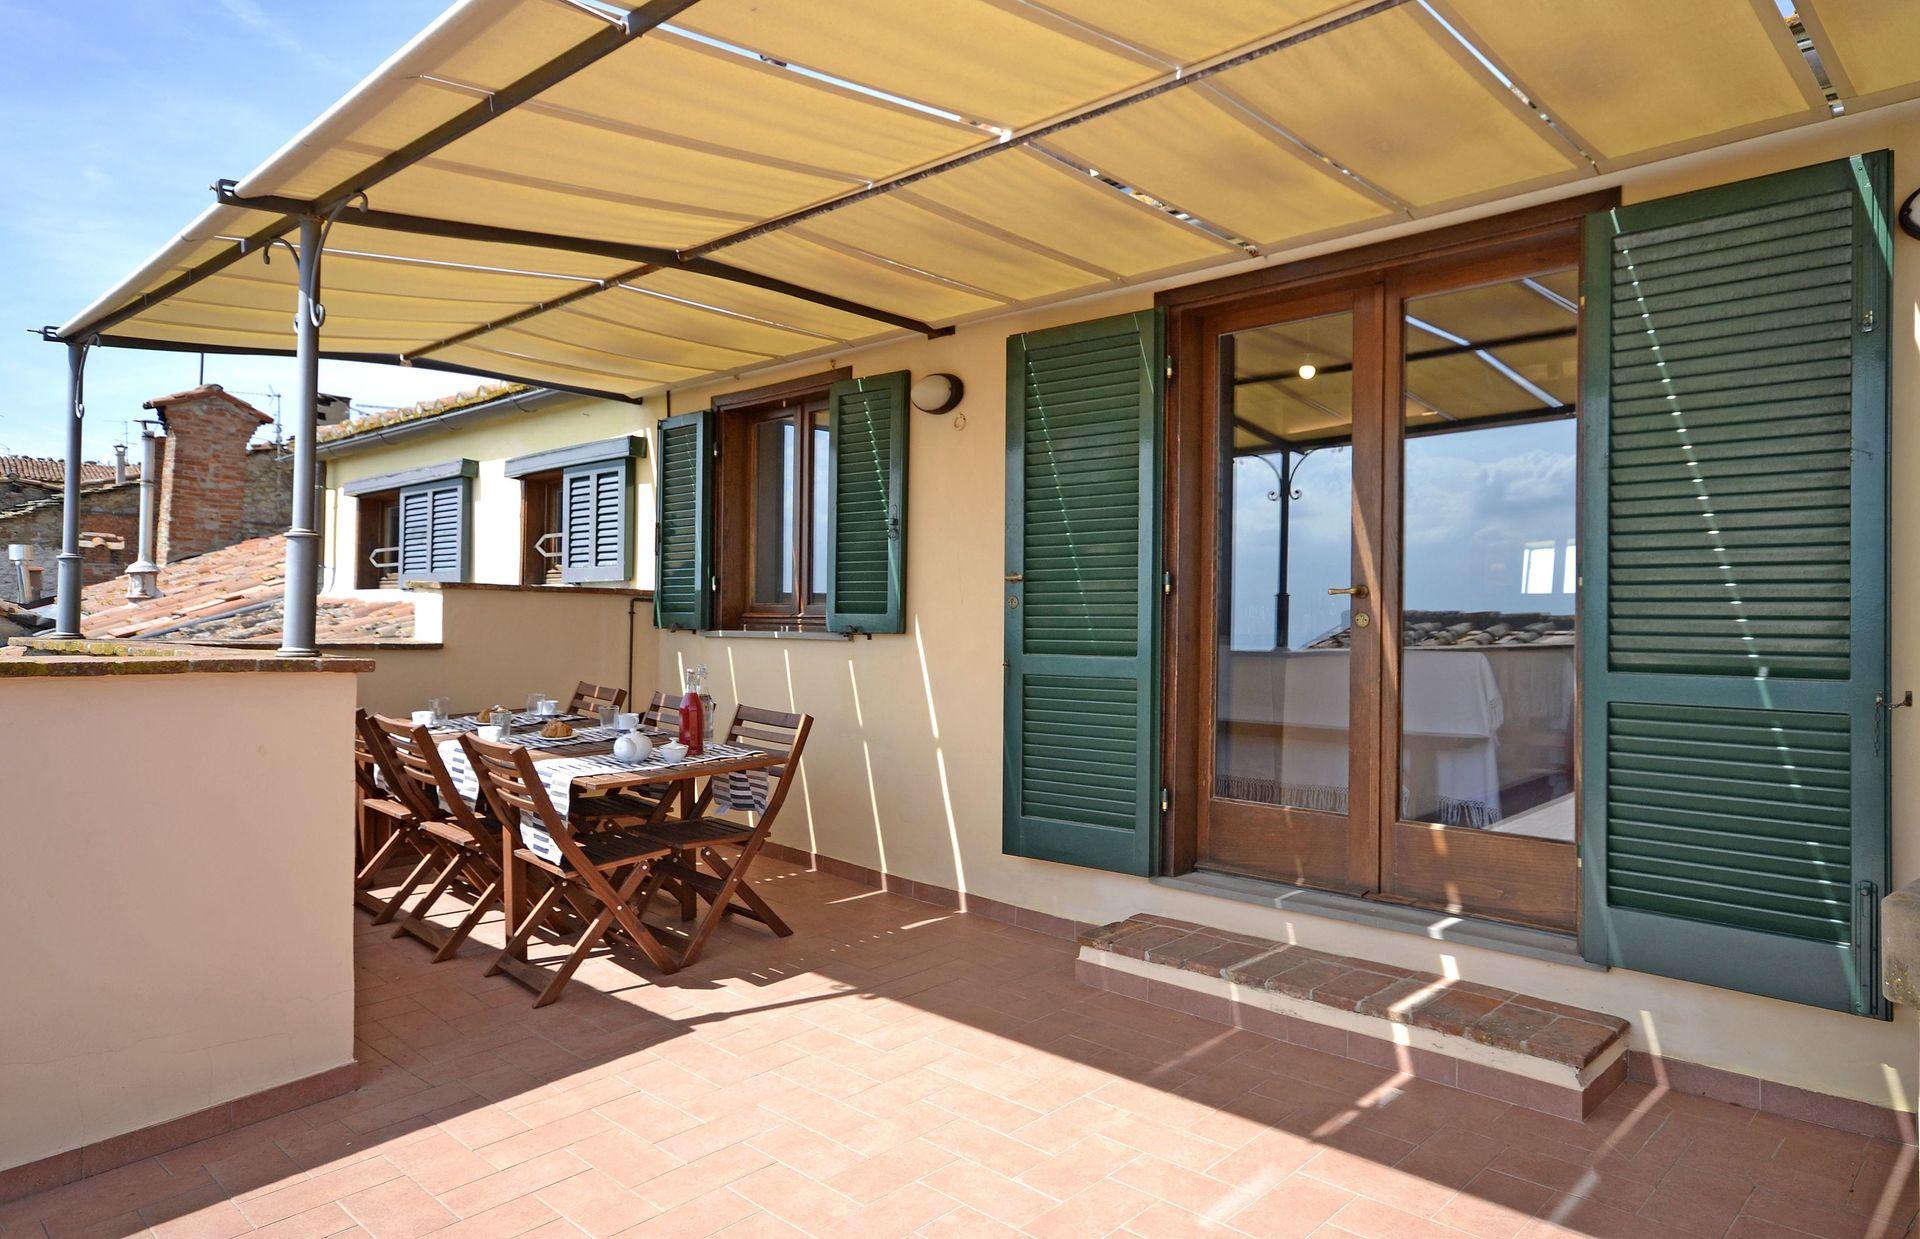 Cortona Charme La Terrazza Cortonese Villa That Sleeps 4